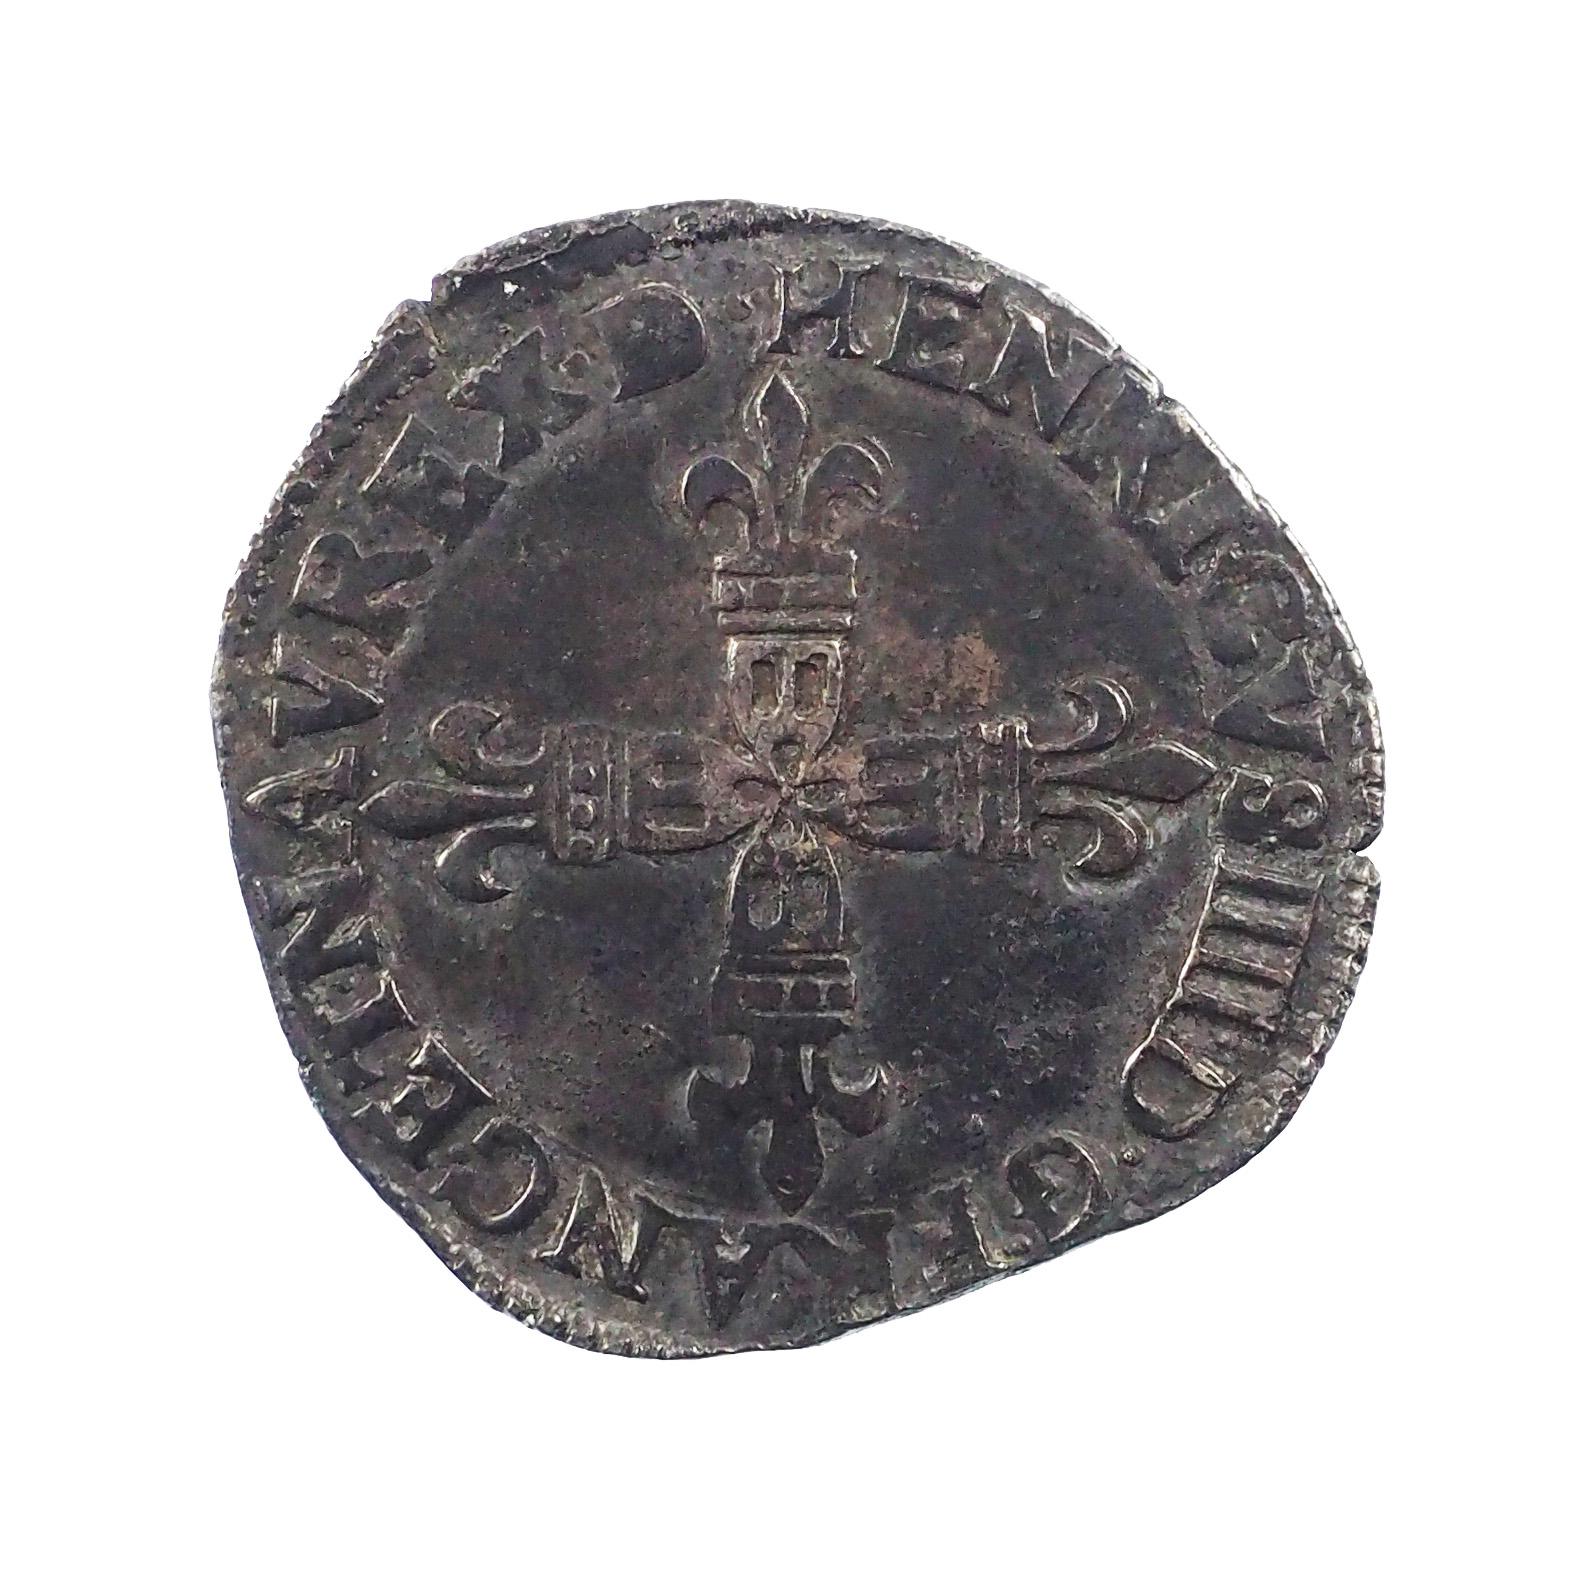 Henri IV (1586-1610), ¼ d'écu de Béarn 1607 Morlaas, 98'468 ex., Duplessy 1240